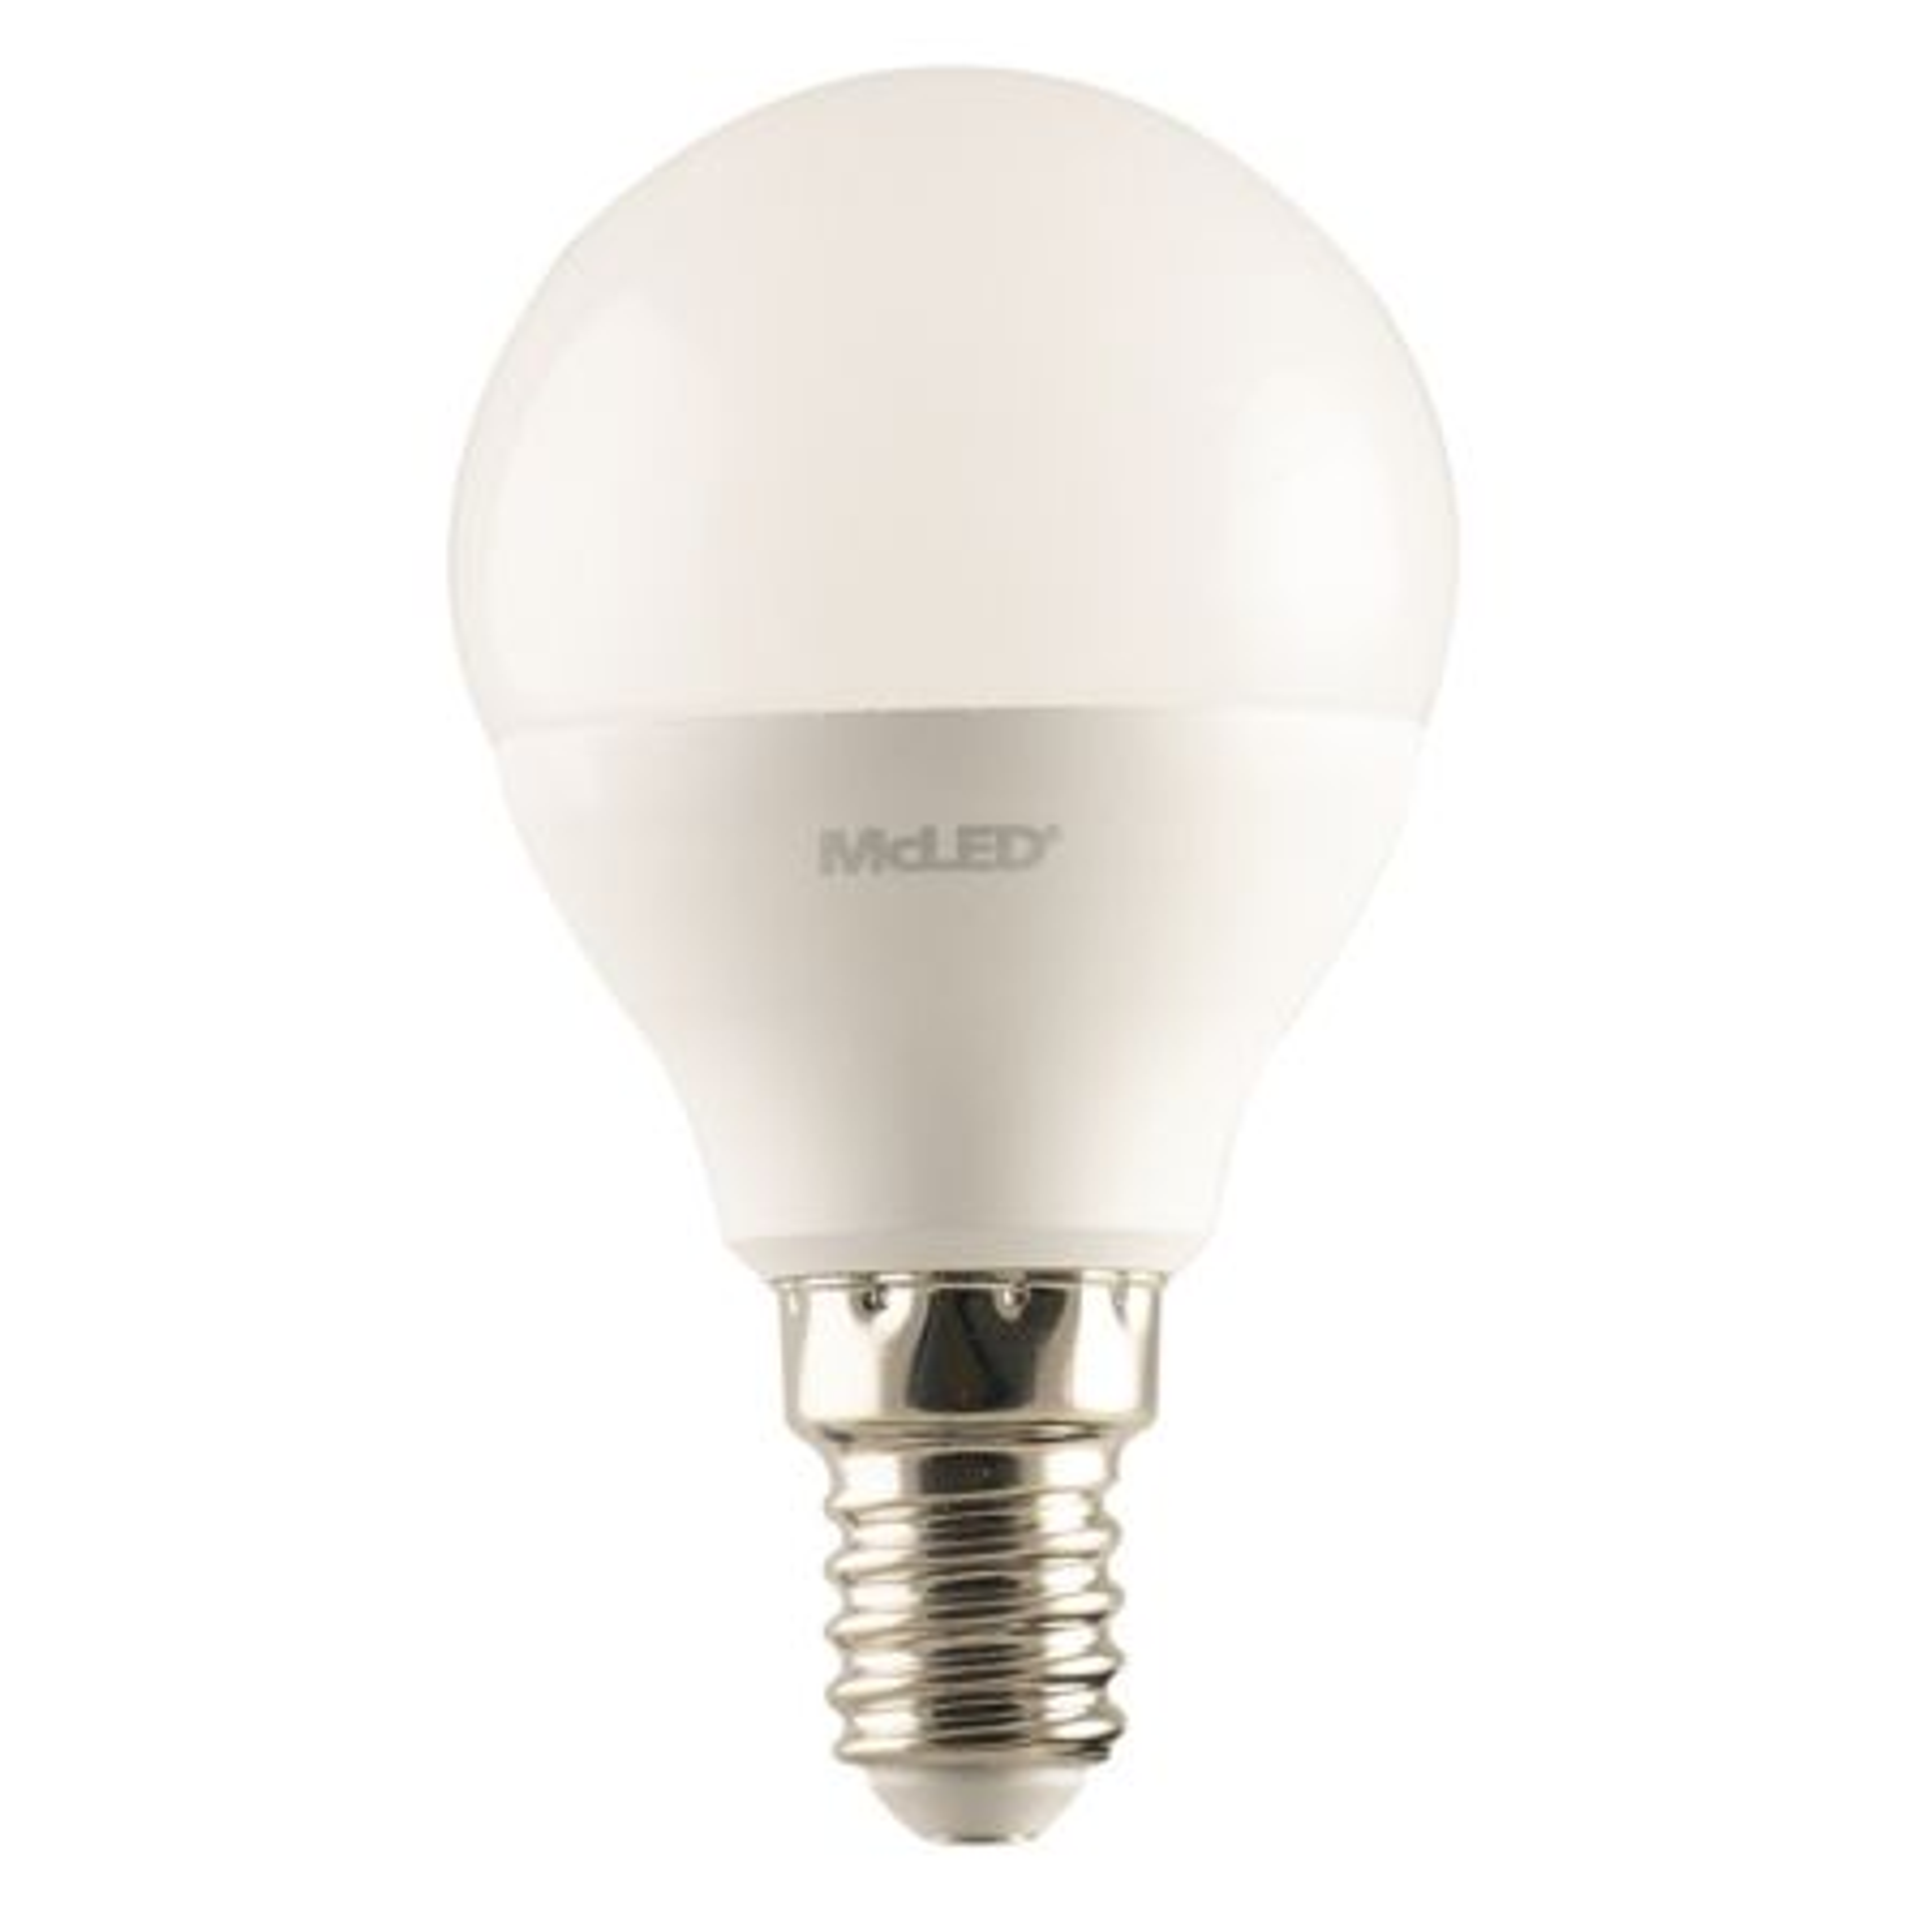 MCLED Žárovka LED 5,5W-40 E14 4000K 200°